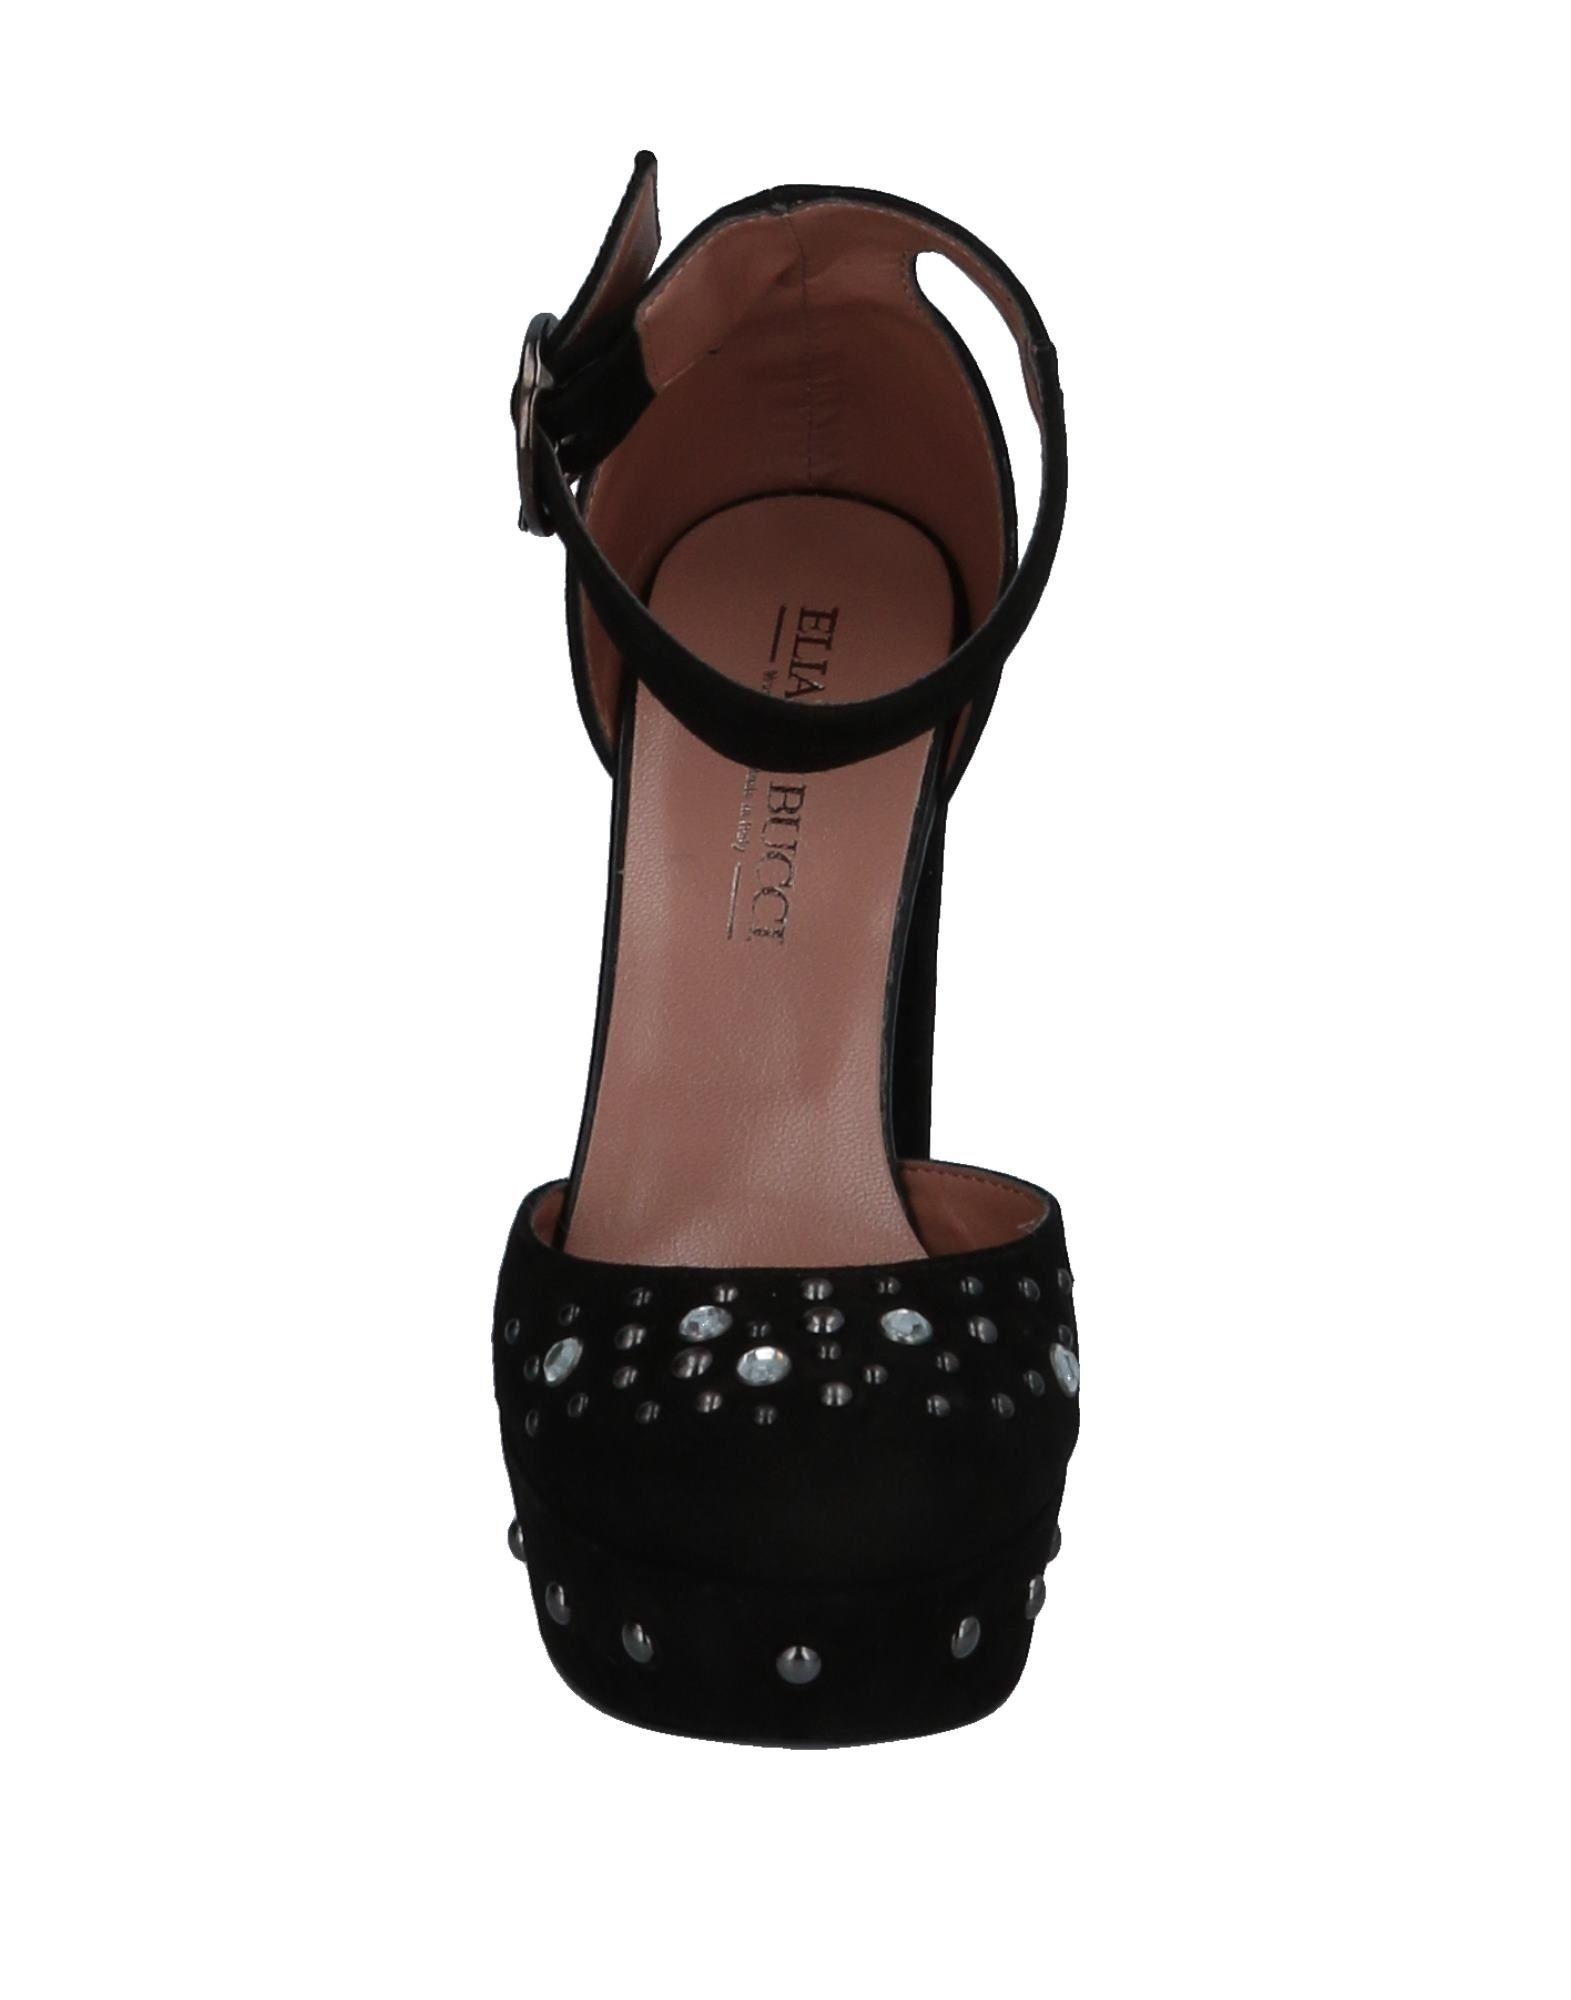 Eliana 11532417TB Bucci Pumps Damen  11532417TB Eliana Gute Qualität beliebte Schuhe 5afdcb